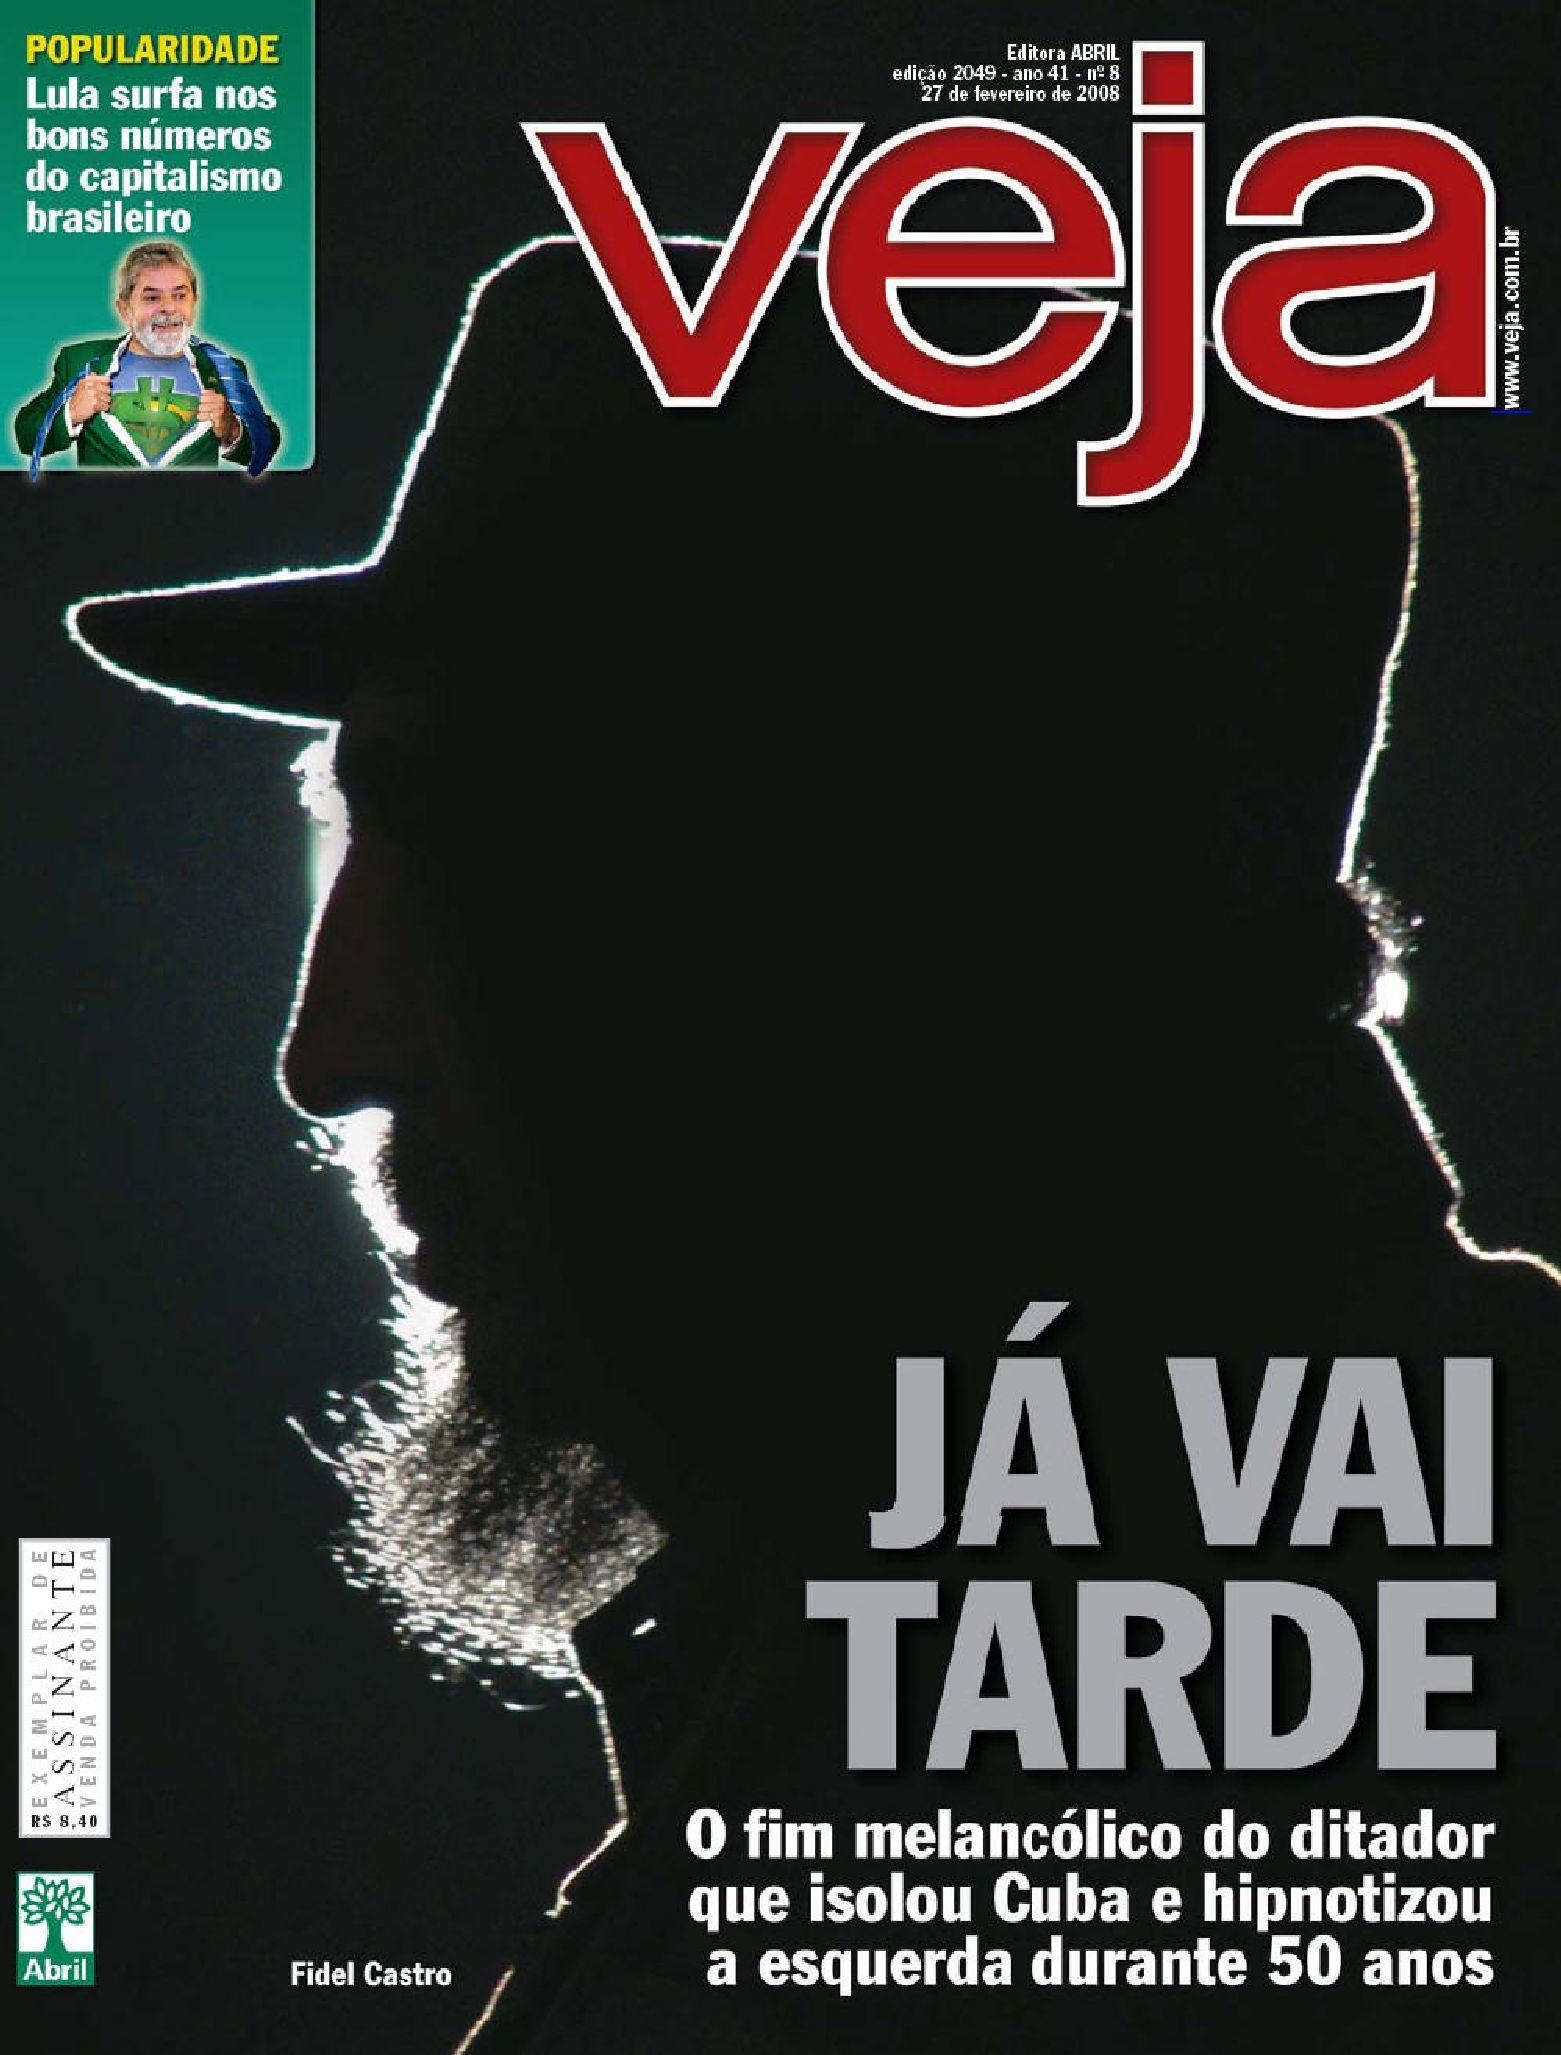 tema Banco Girar en descubierto  Revista Veja - 27/02/2008 by ckasyo - issuu